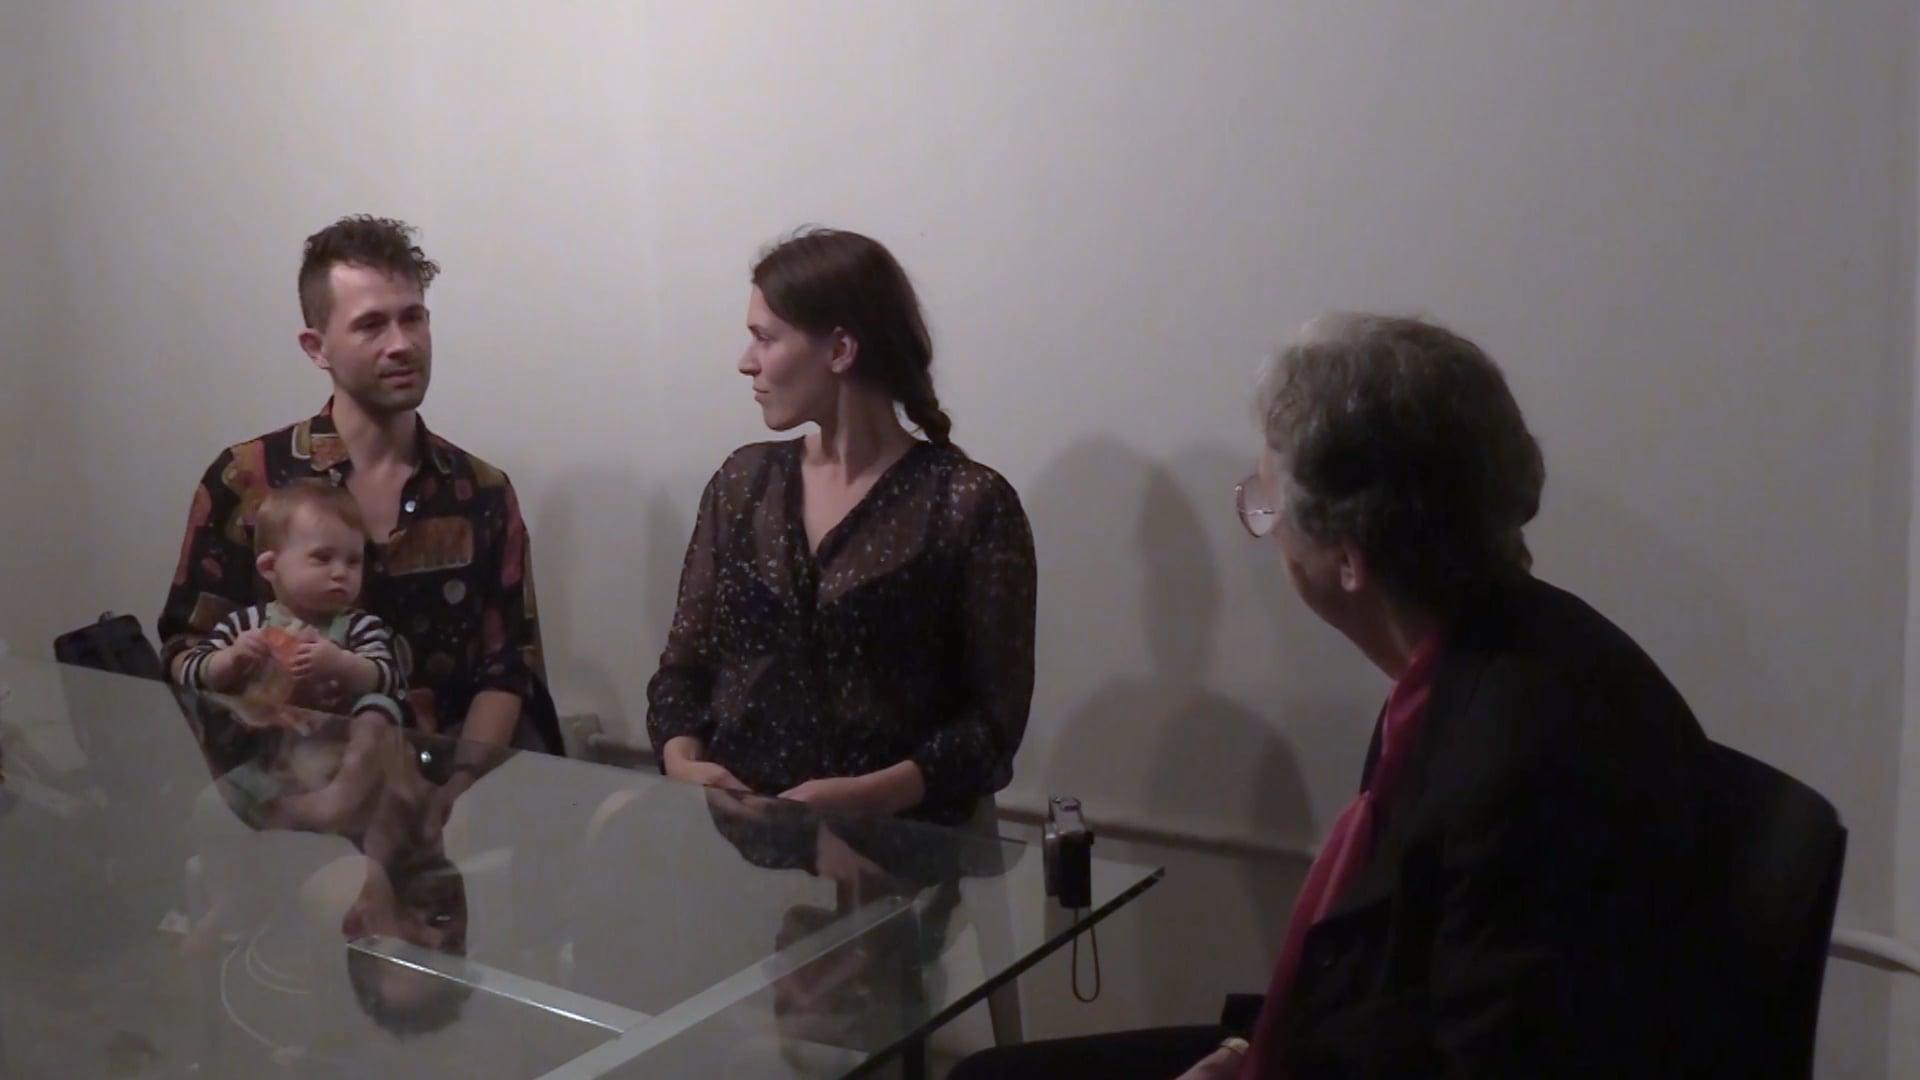 Interview with Jacob Kirkegaard and Katinka Fogh Vindelev